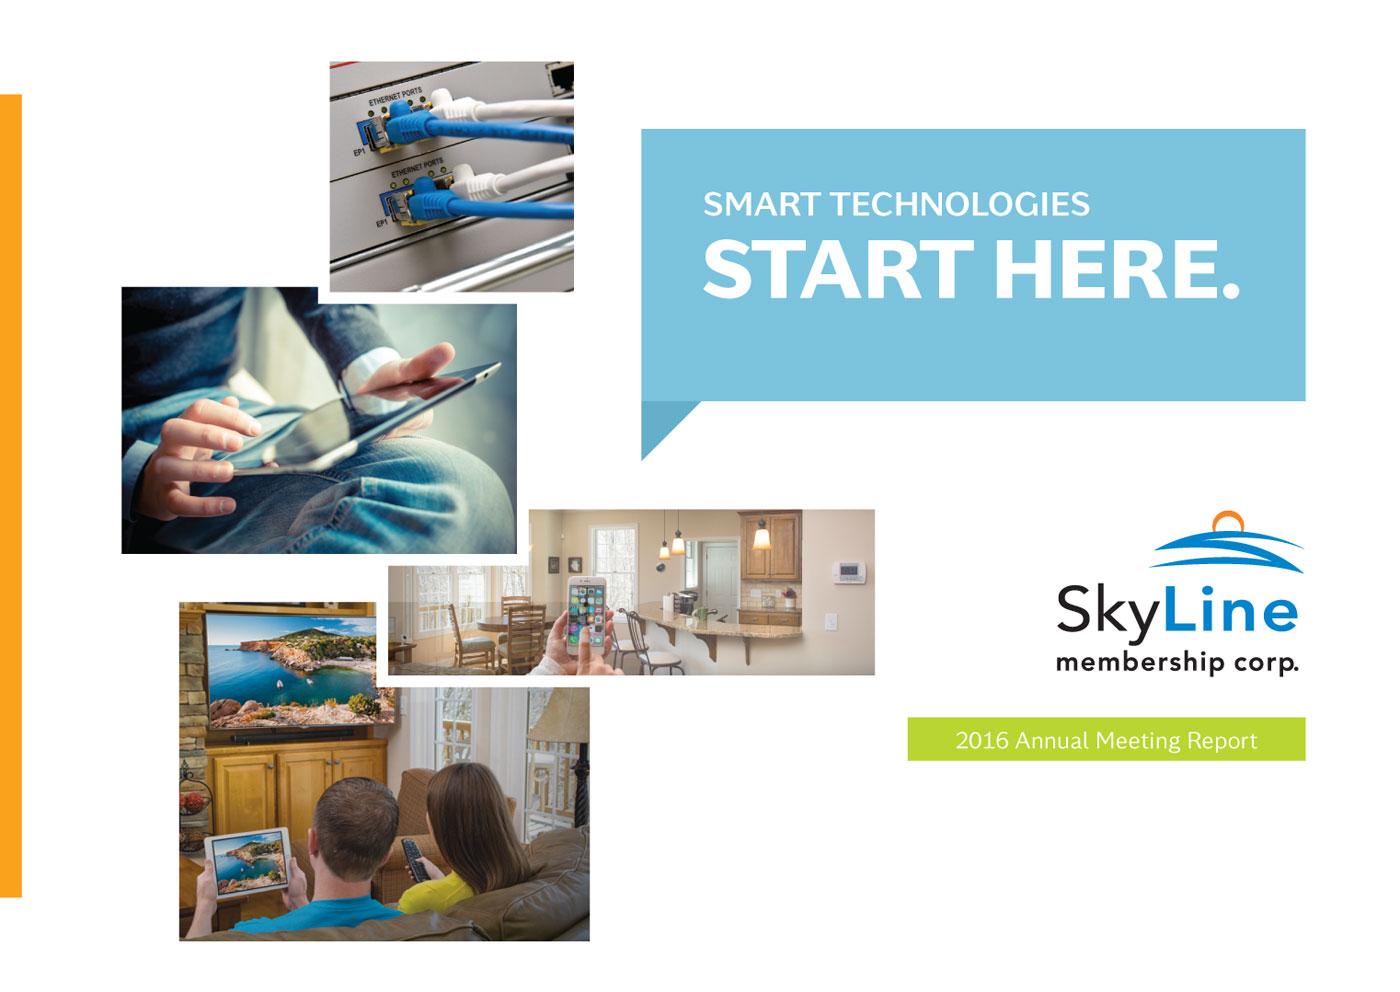 Smart Technologies Start Here